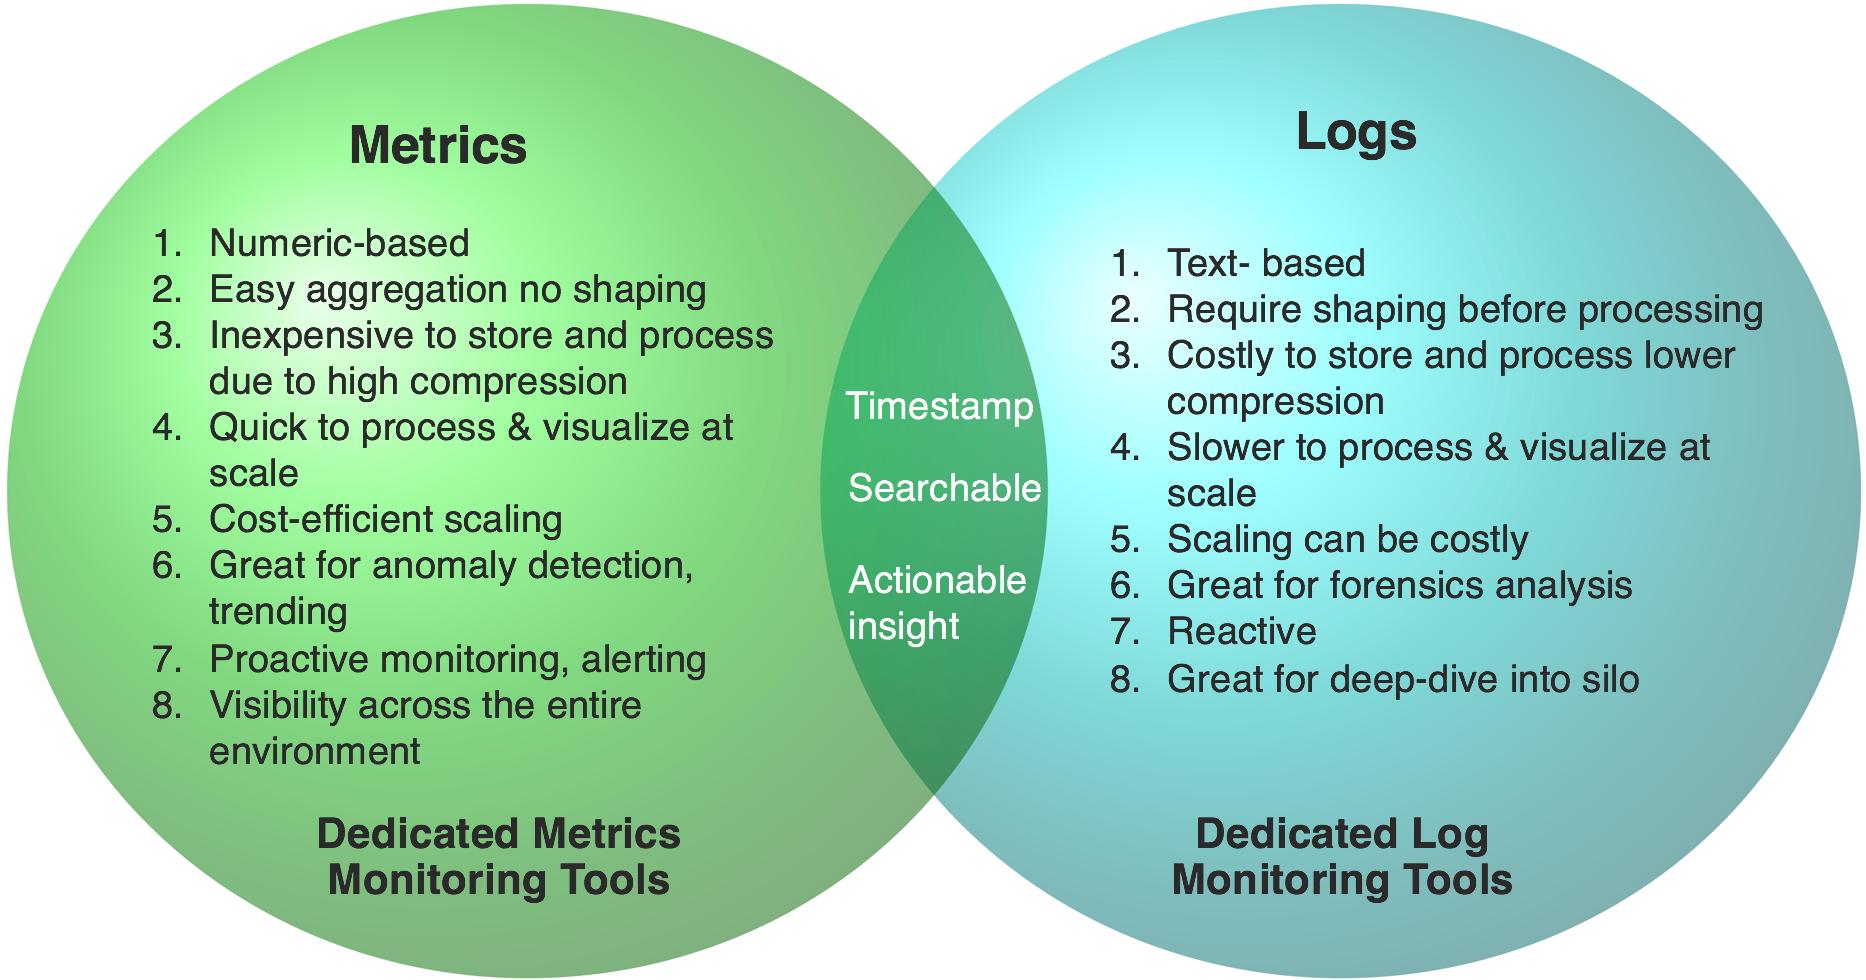 Metrics vs Logs fig 1